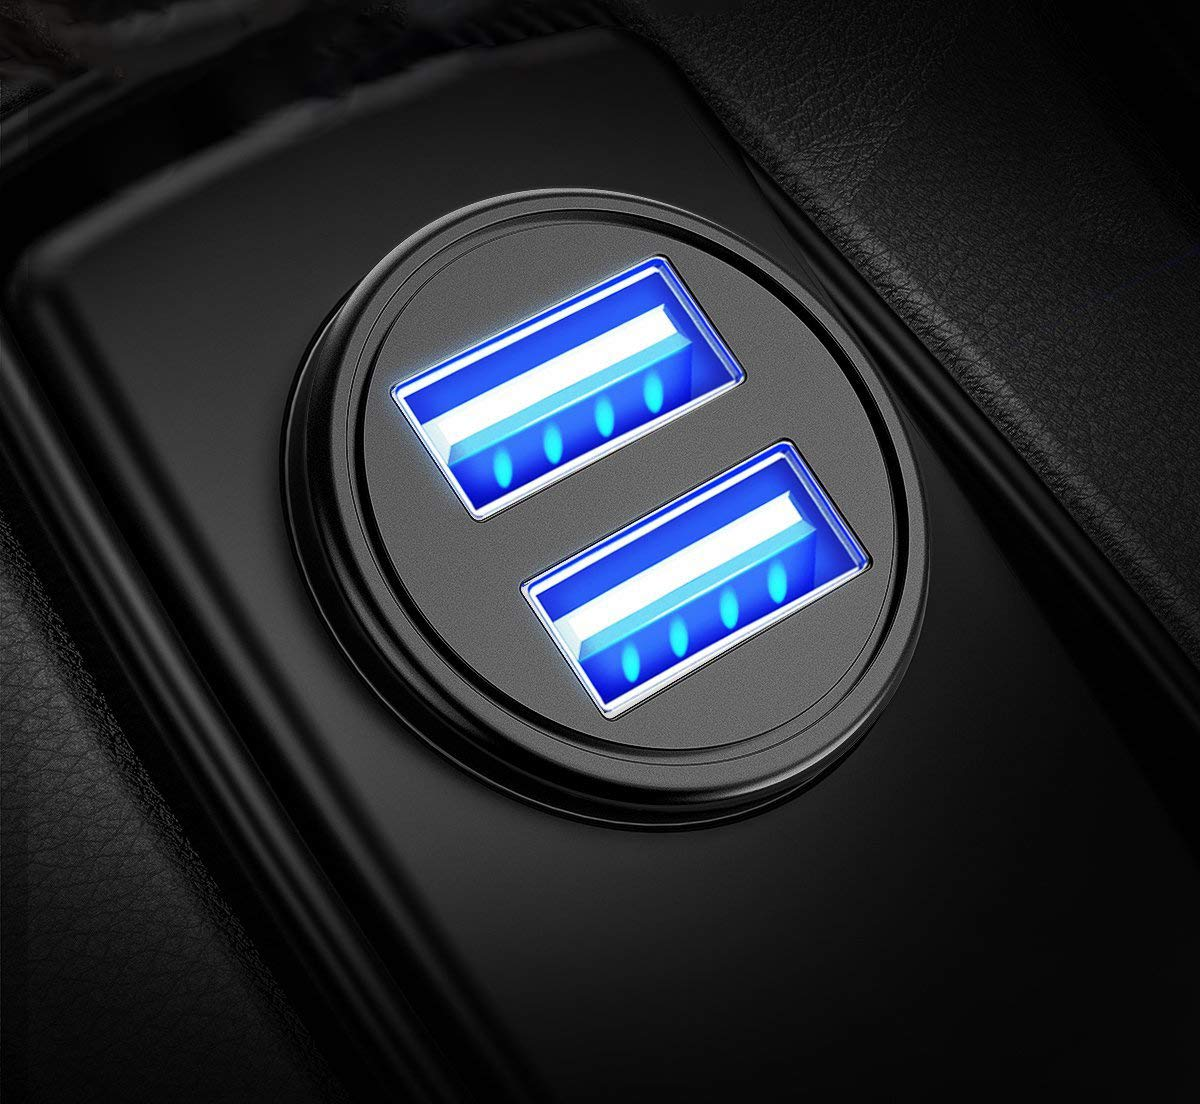 hsr car charger